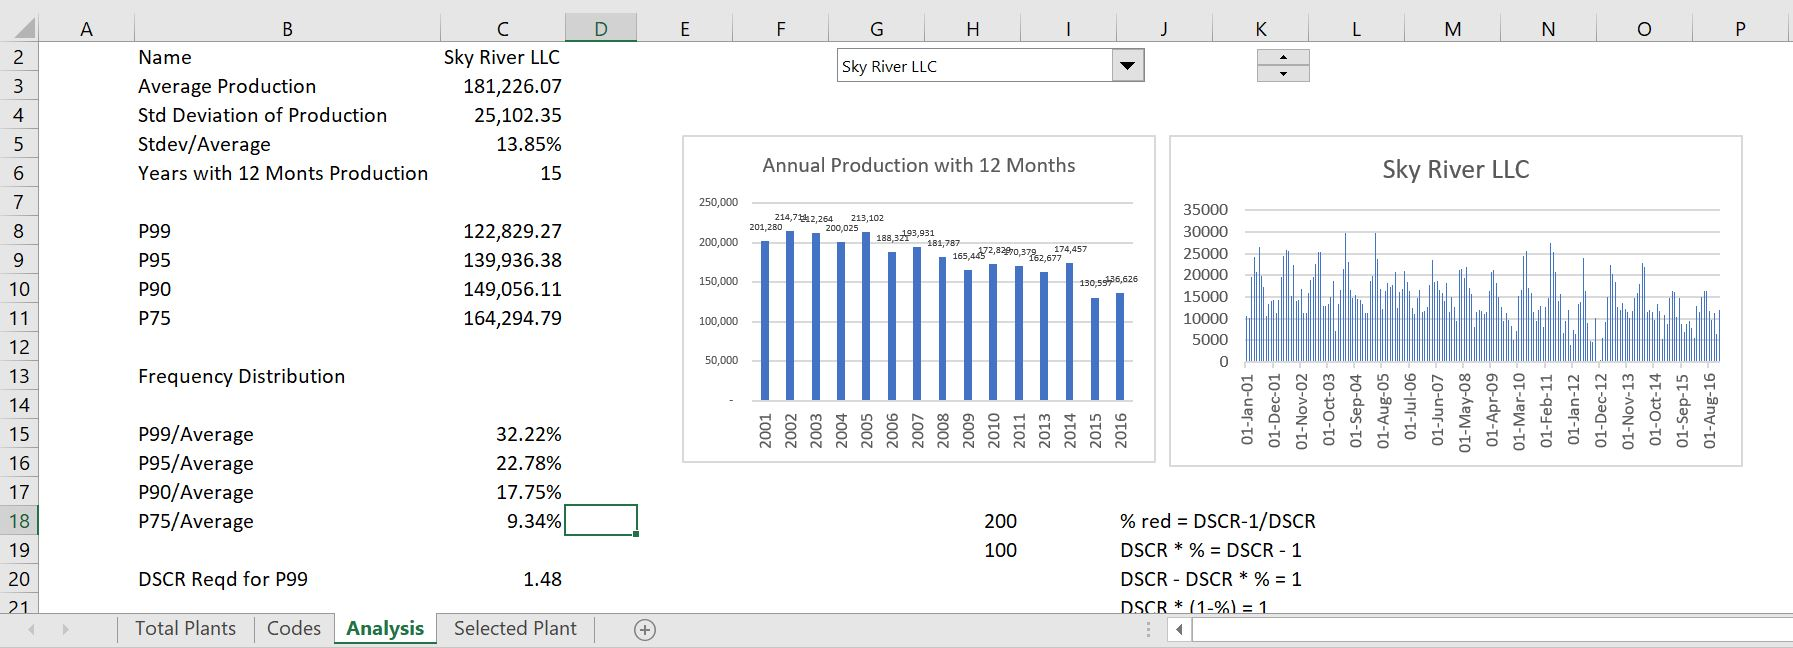 Wind P99, P90, P50 (1-year, 10-year) and Debt Sizing – Edward Bodmer